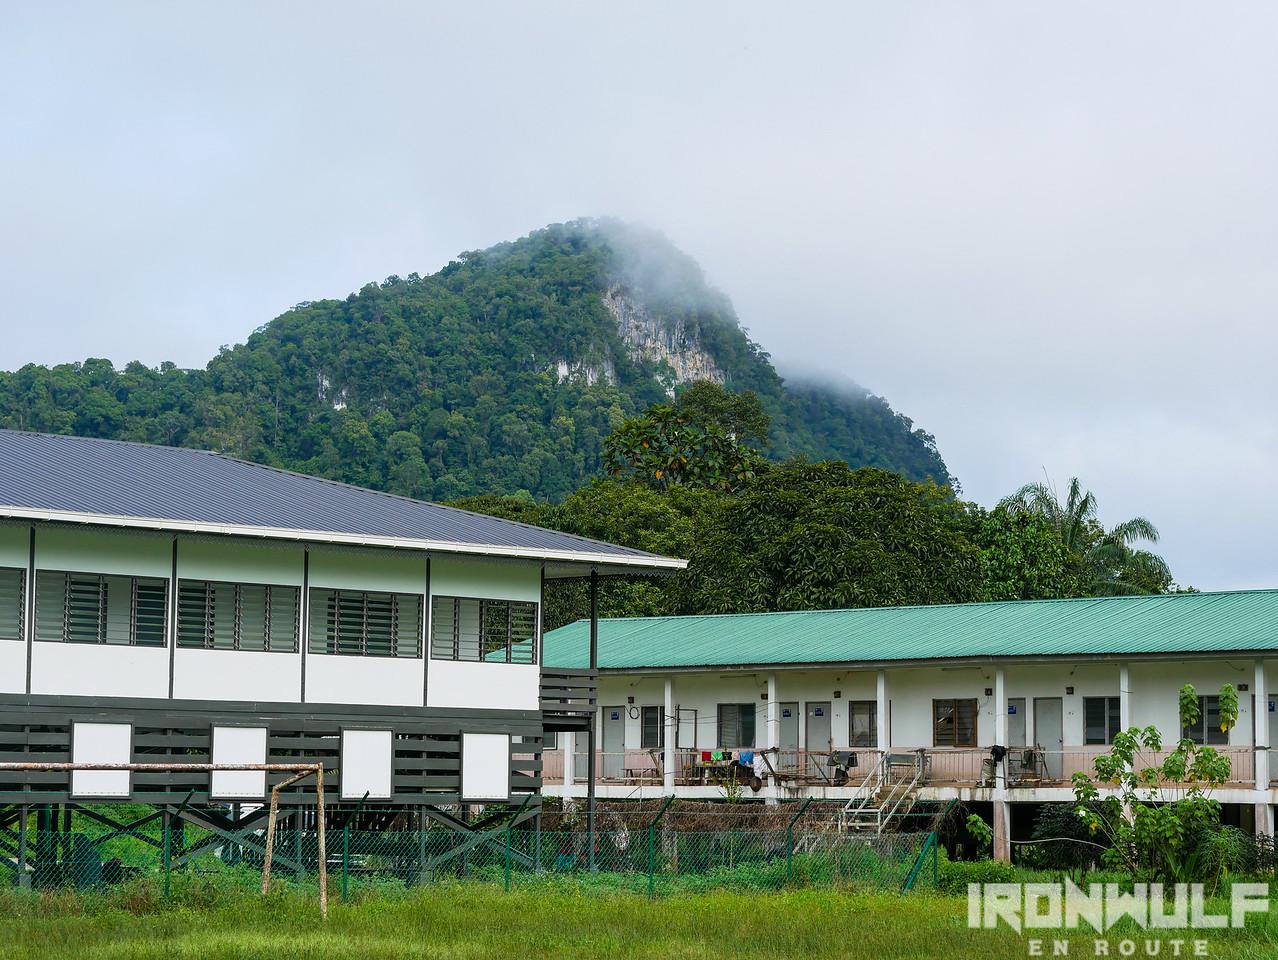 The Batu Bungan rocks overlooking the small village